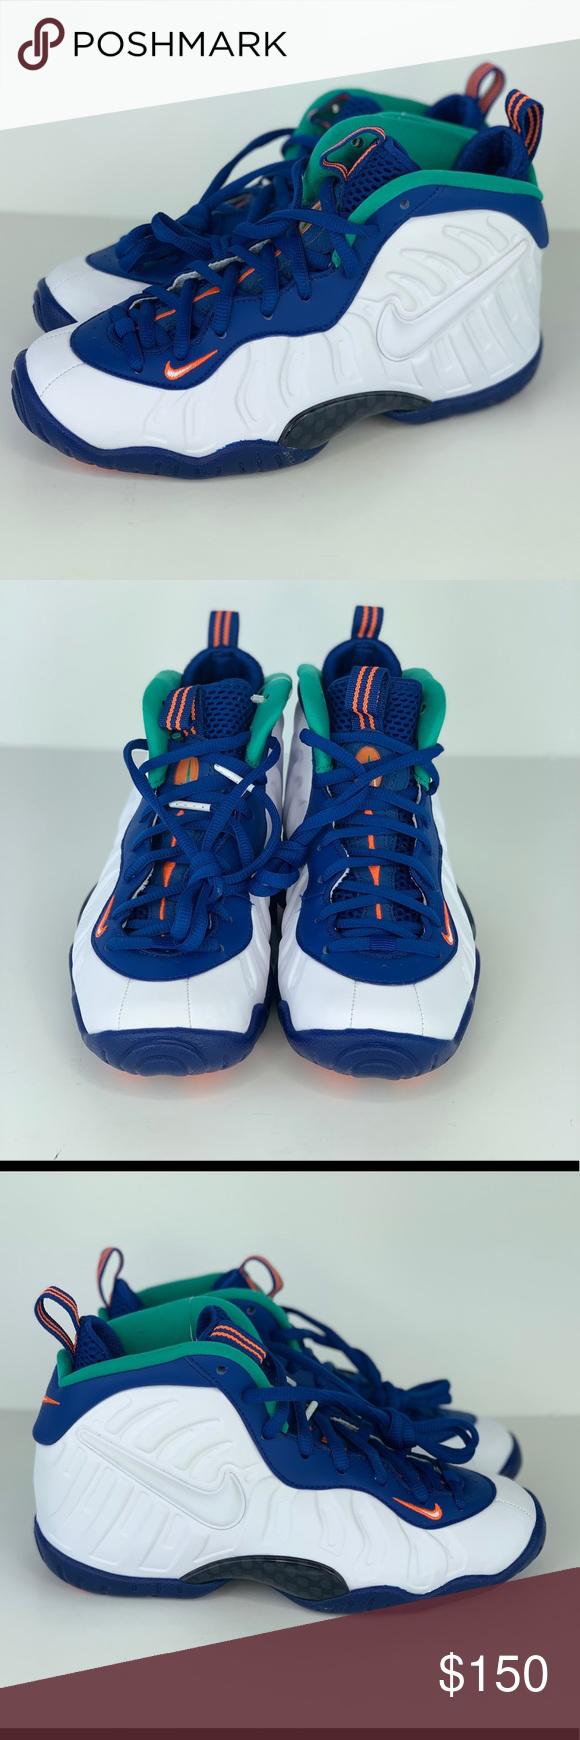 sale retailer 12083 1e826 Nike Little Posite Pro GS 'Neptune Green' Sz 3.5Y Brand new ...